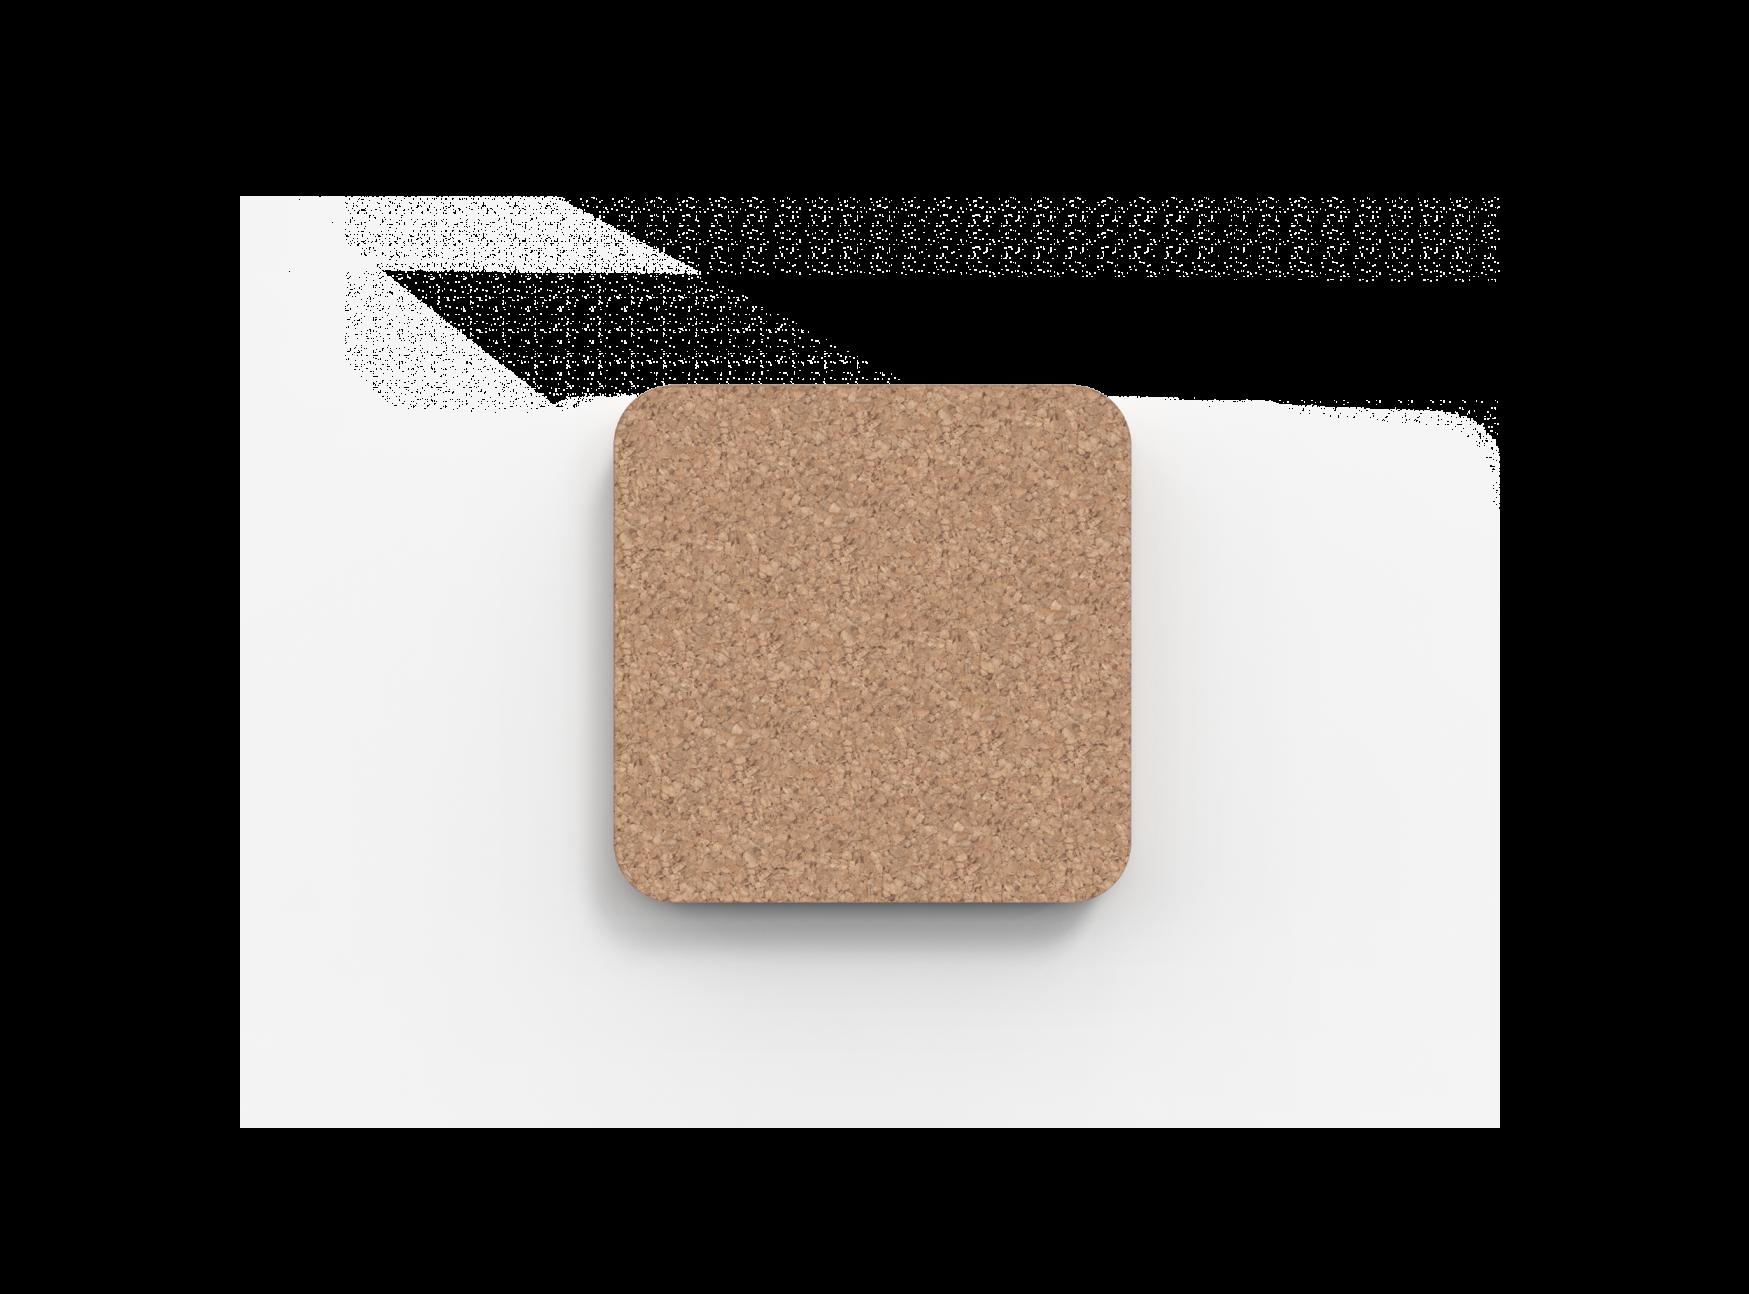 Bloc Cork (600 x 600)